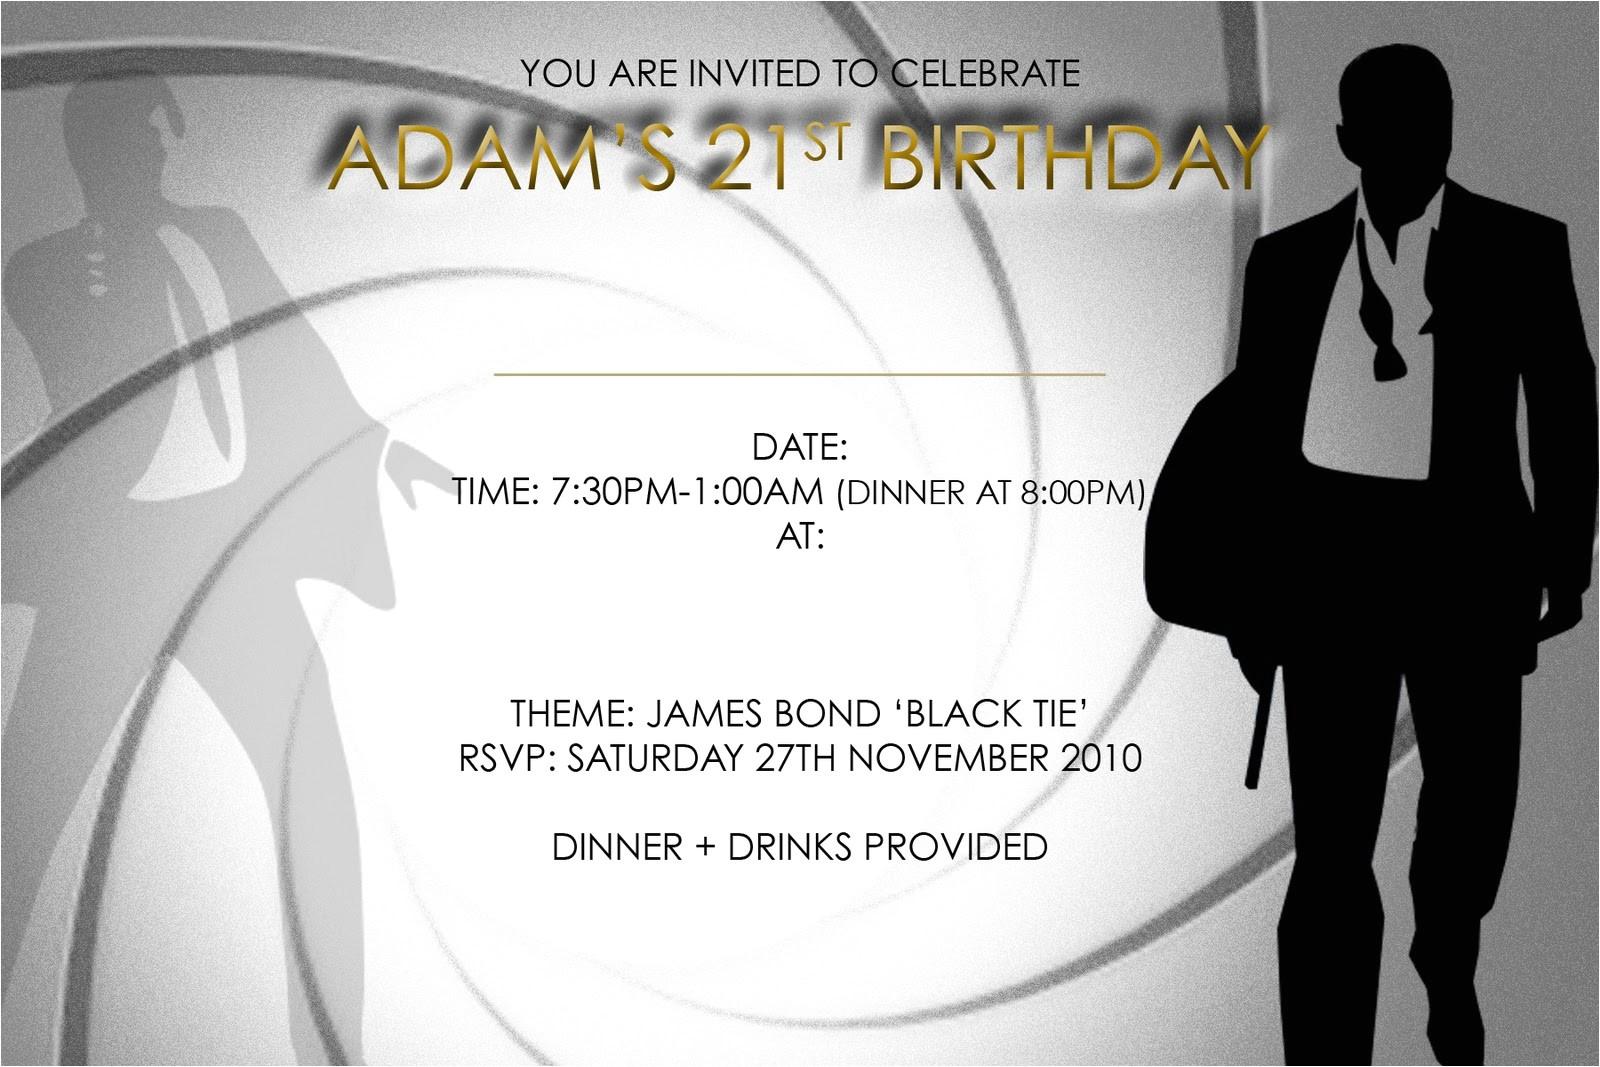 21 Birthday Invitations Templates Free 21st Birthday Invitations Designs Cloudinvitation